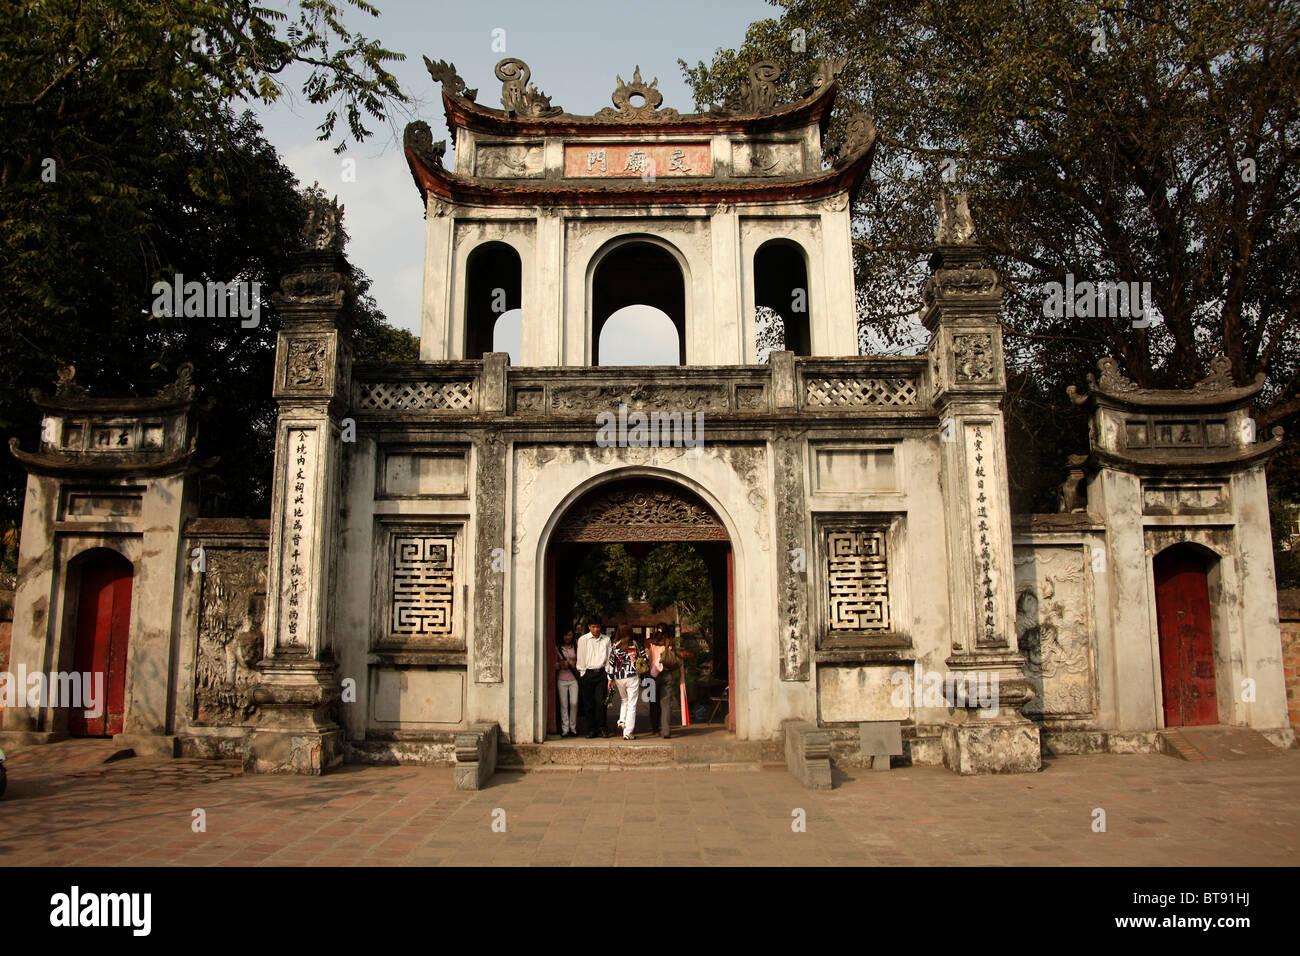 Portal to the Temple of Literature Van Mieu, Hanoi, Vietnam, Asia - Stock Image